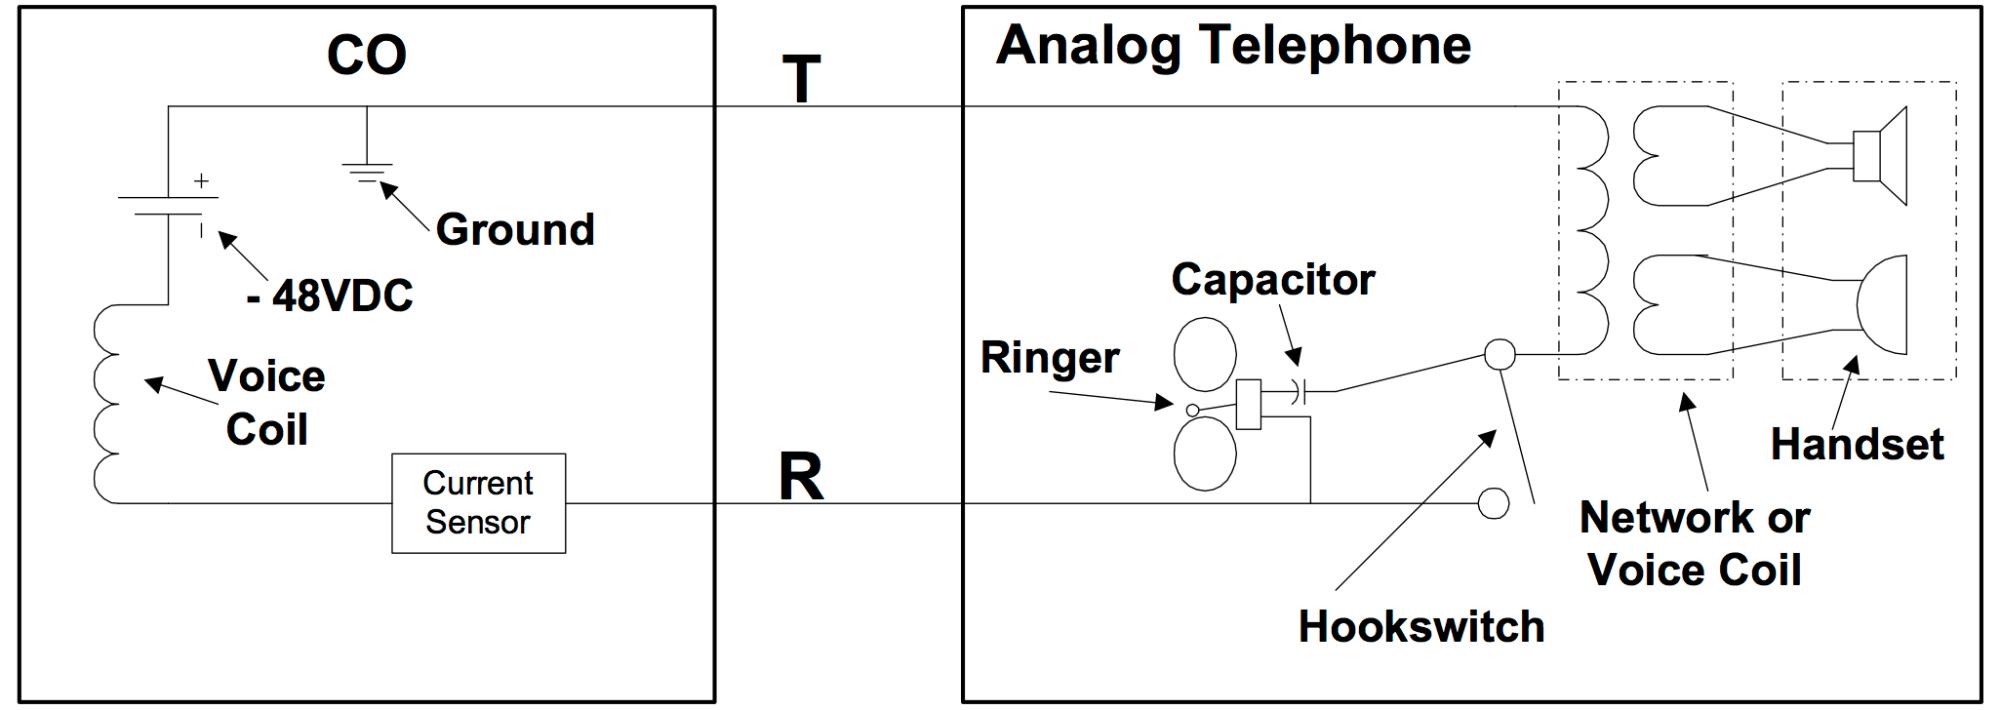 hight resolution of telephone grounding diagram schematic diagram data analog phone wiring